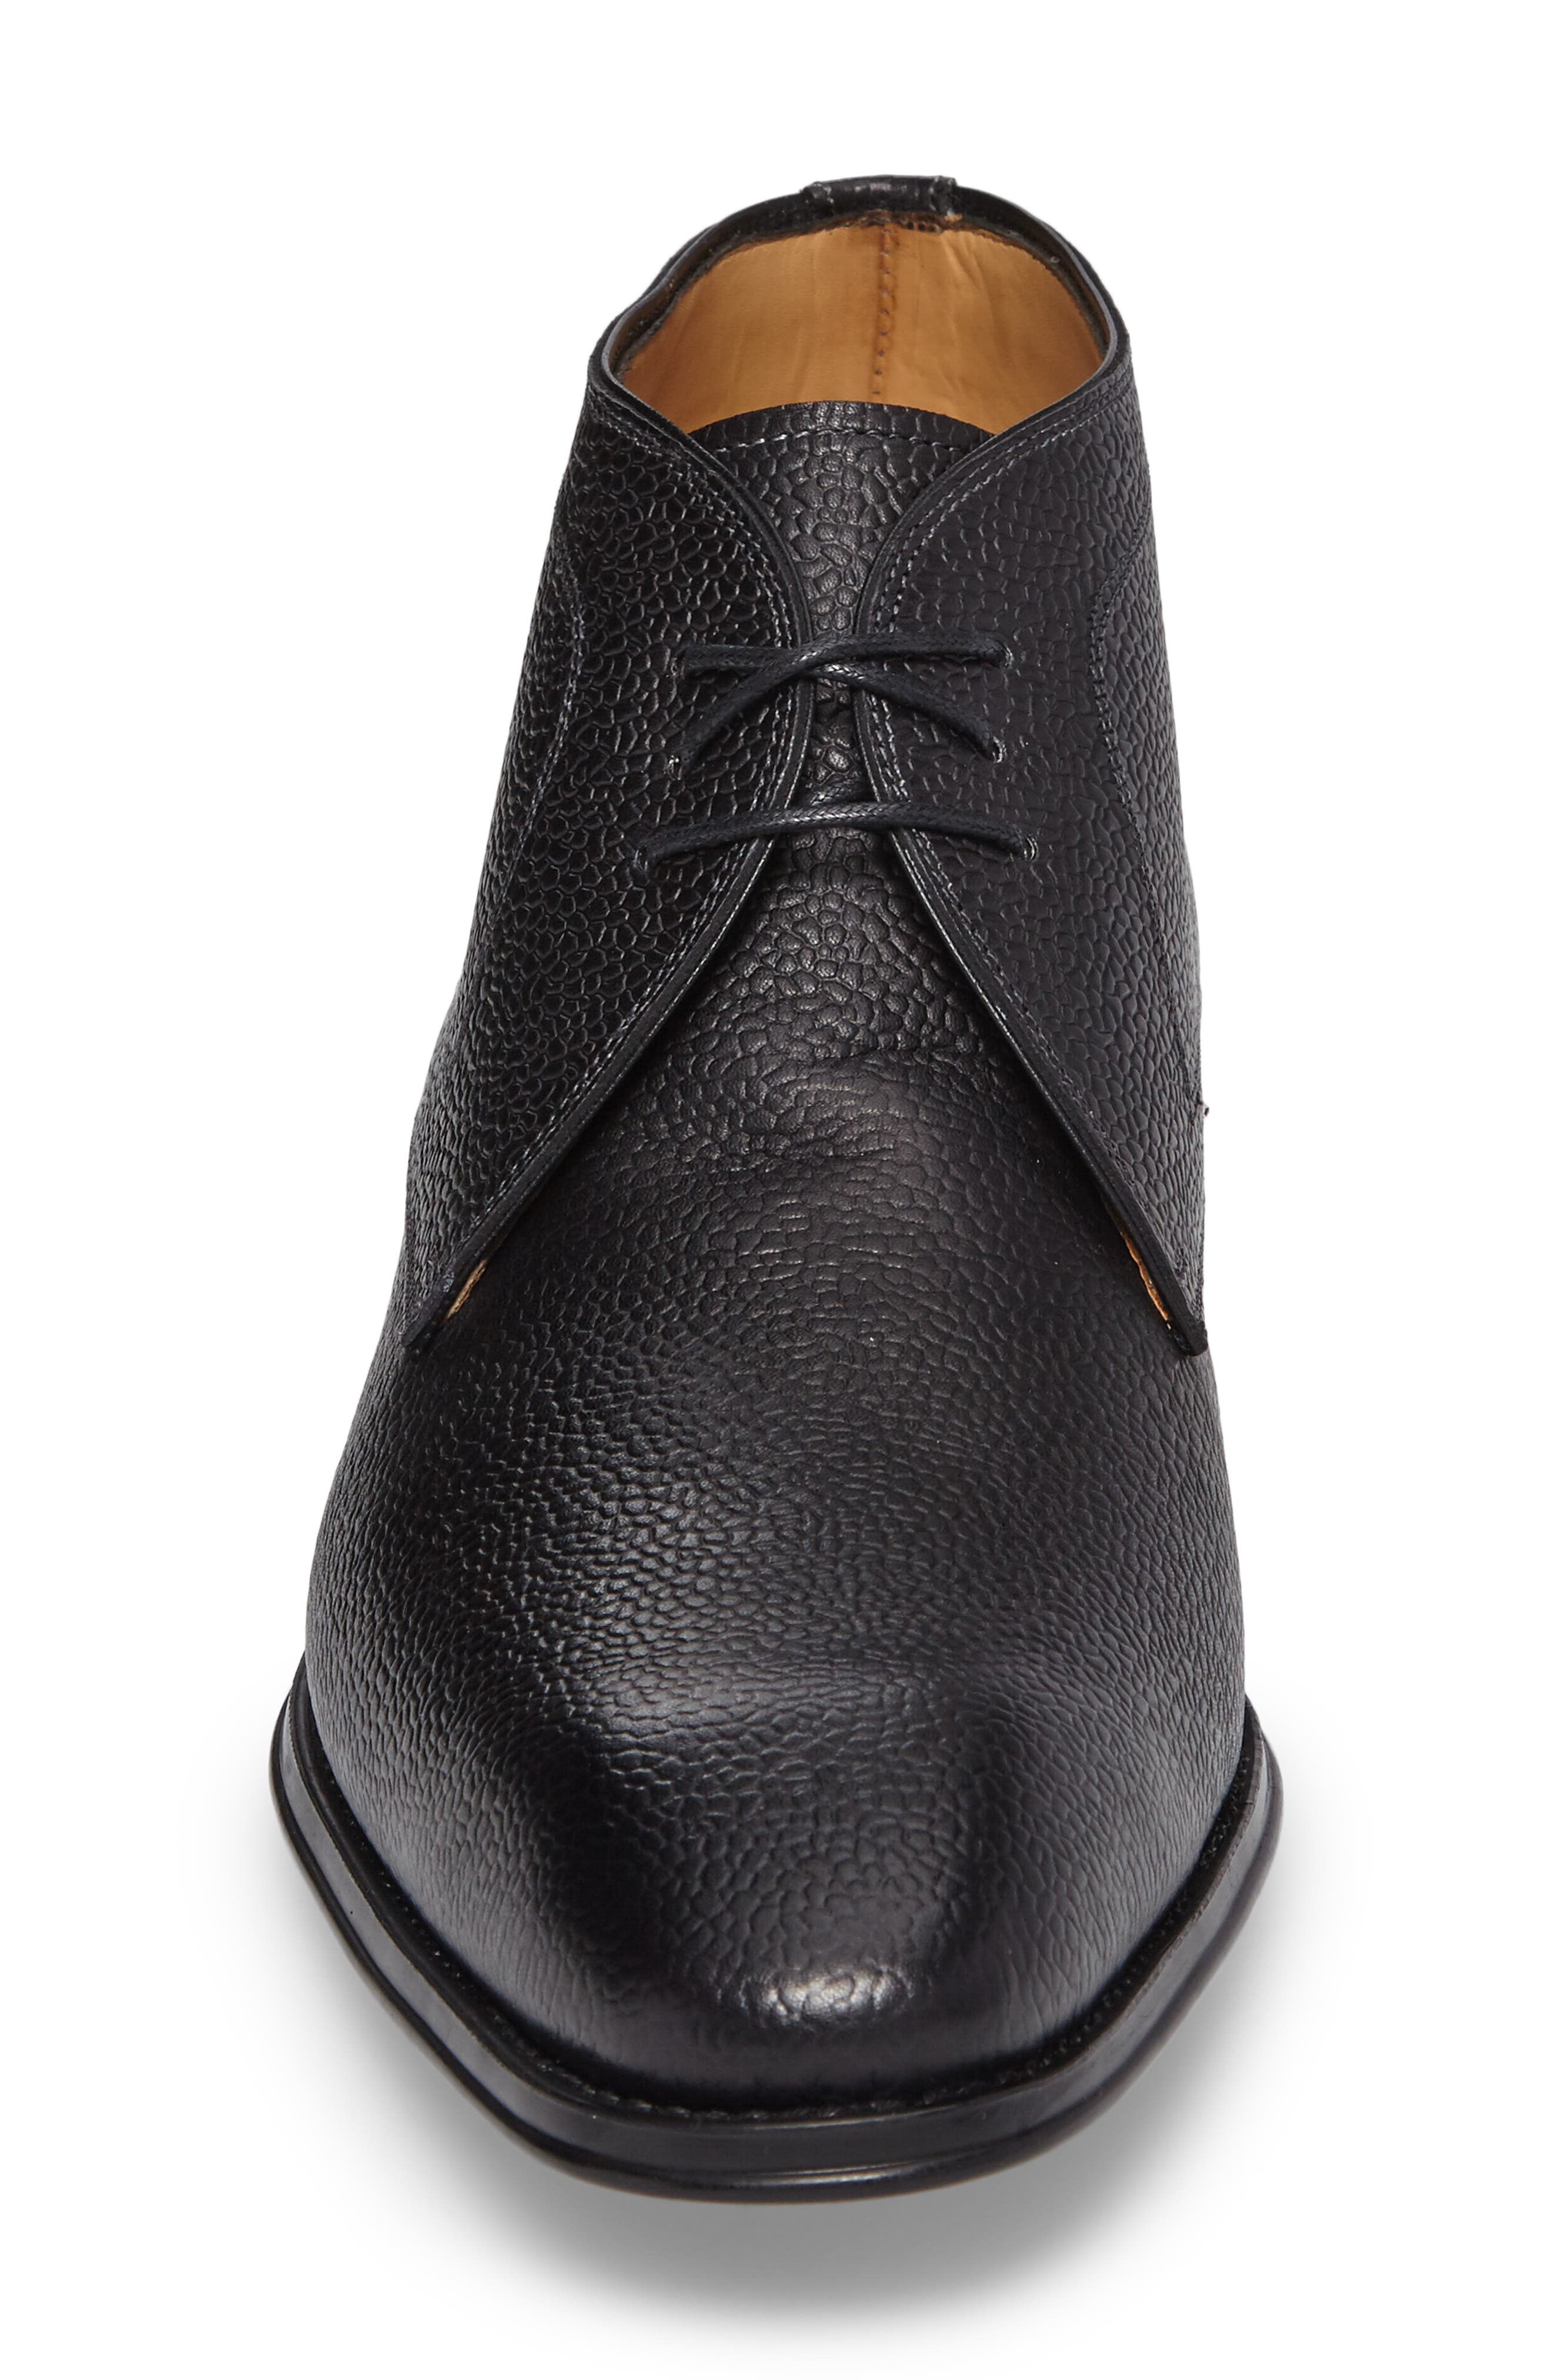 Cabra Plain Toe Derby,                             Alternate thumbnail 4, color,                             BLACK LEATHER